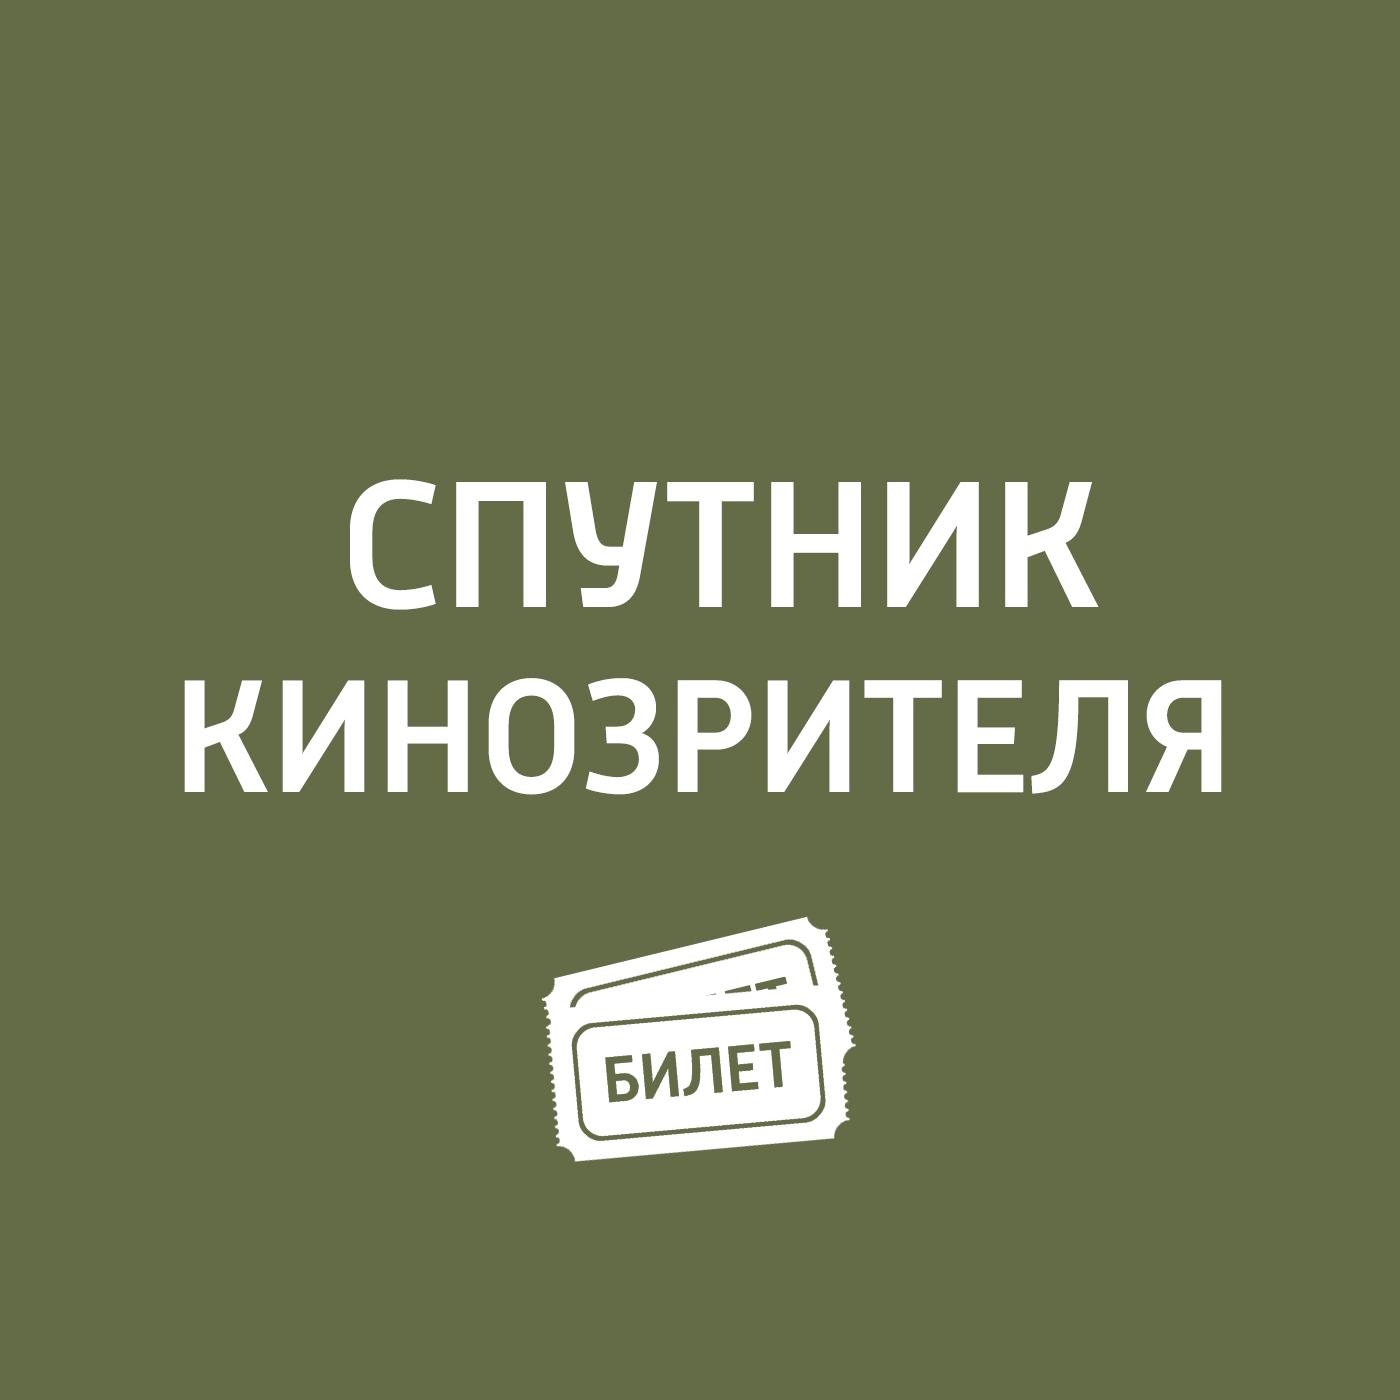 Антон Долин Курьер из «Рая, «Шоппинг-тур, «Каньоны тур якутск